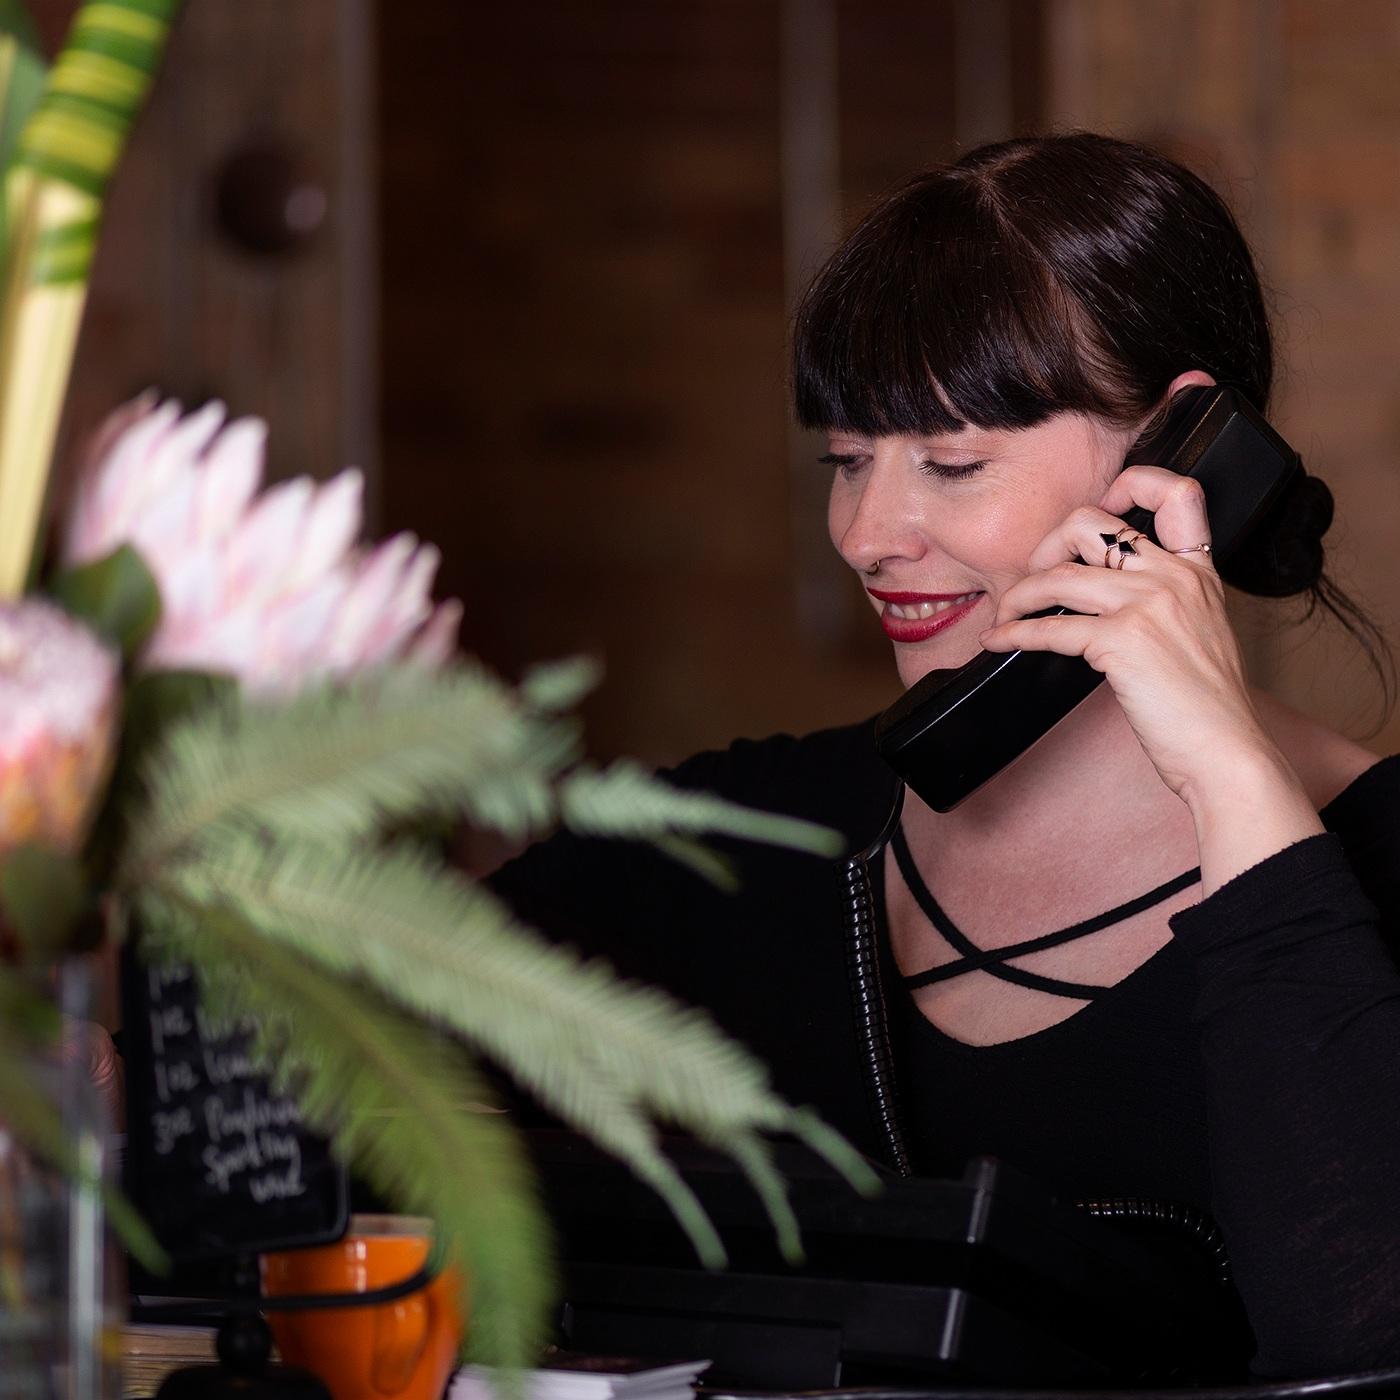 Lindsay Answering Phone